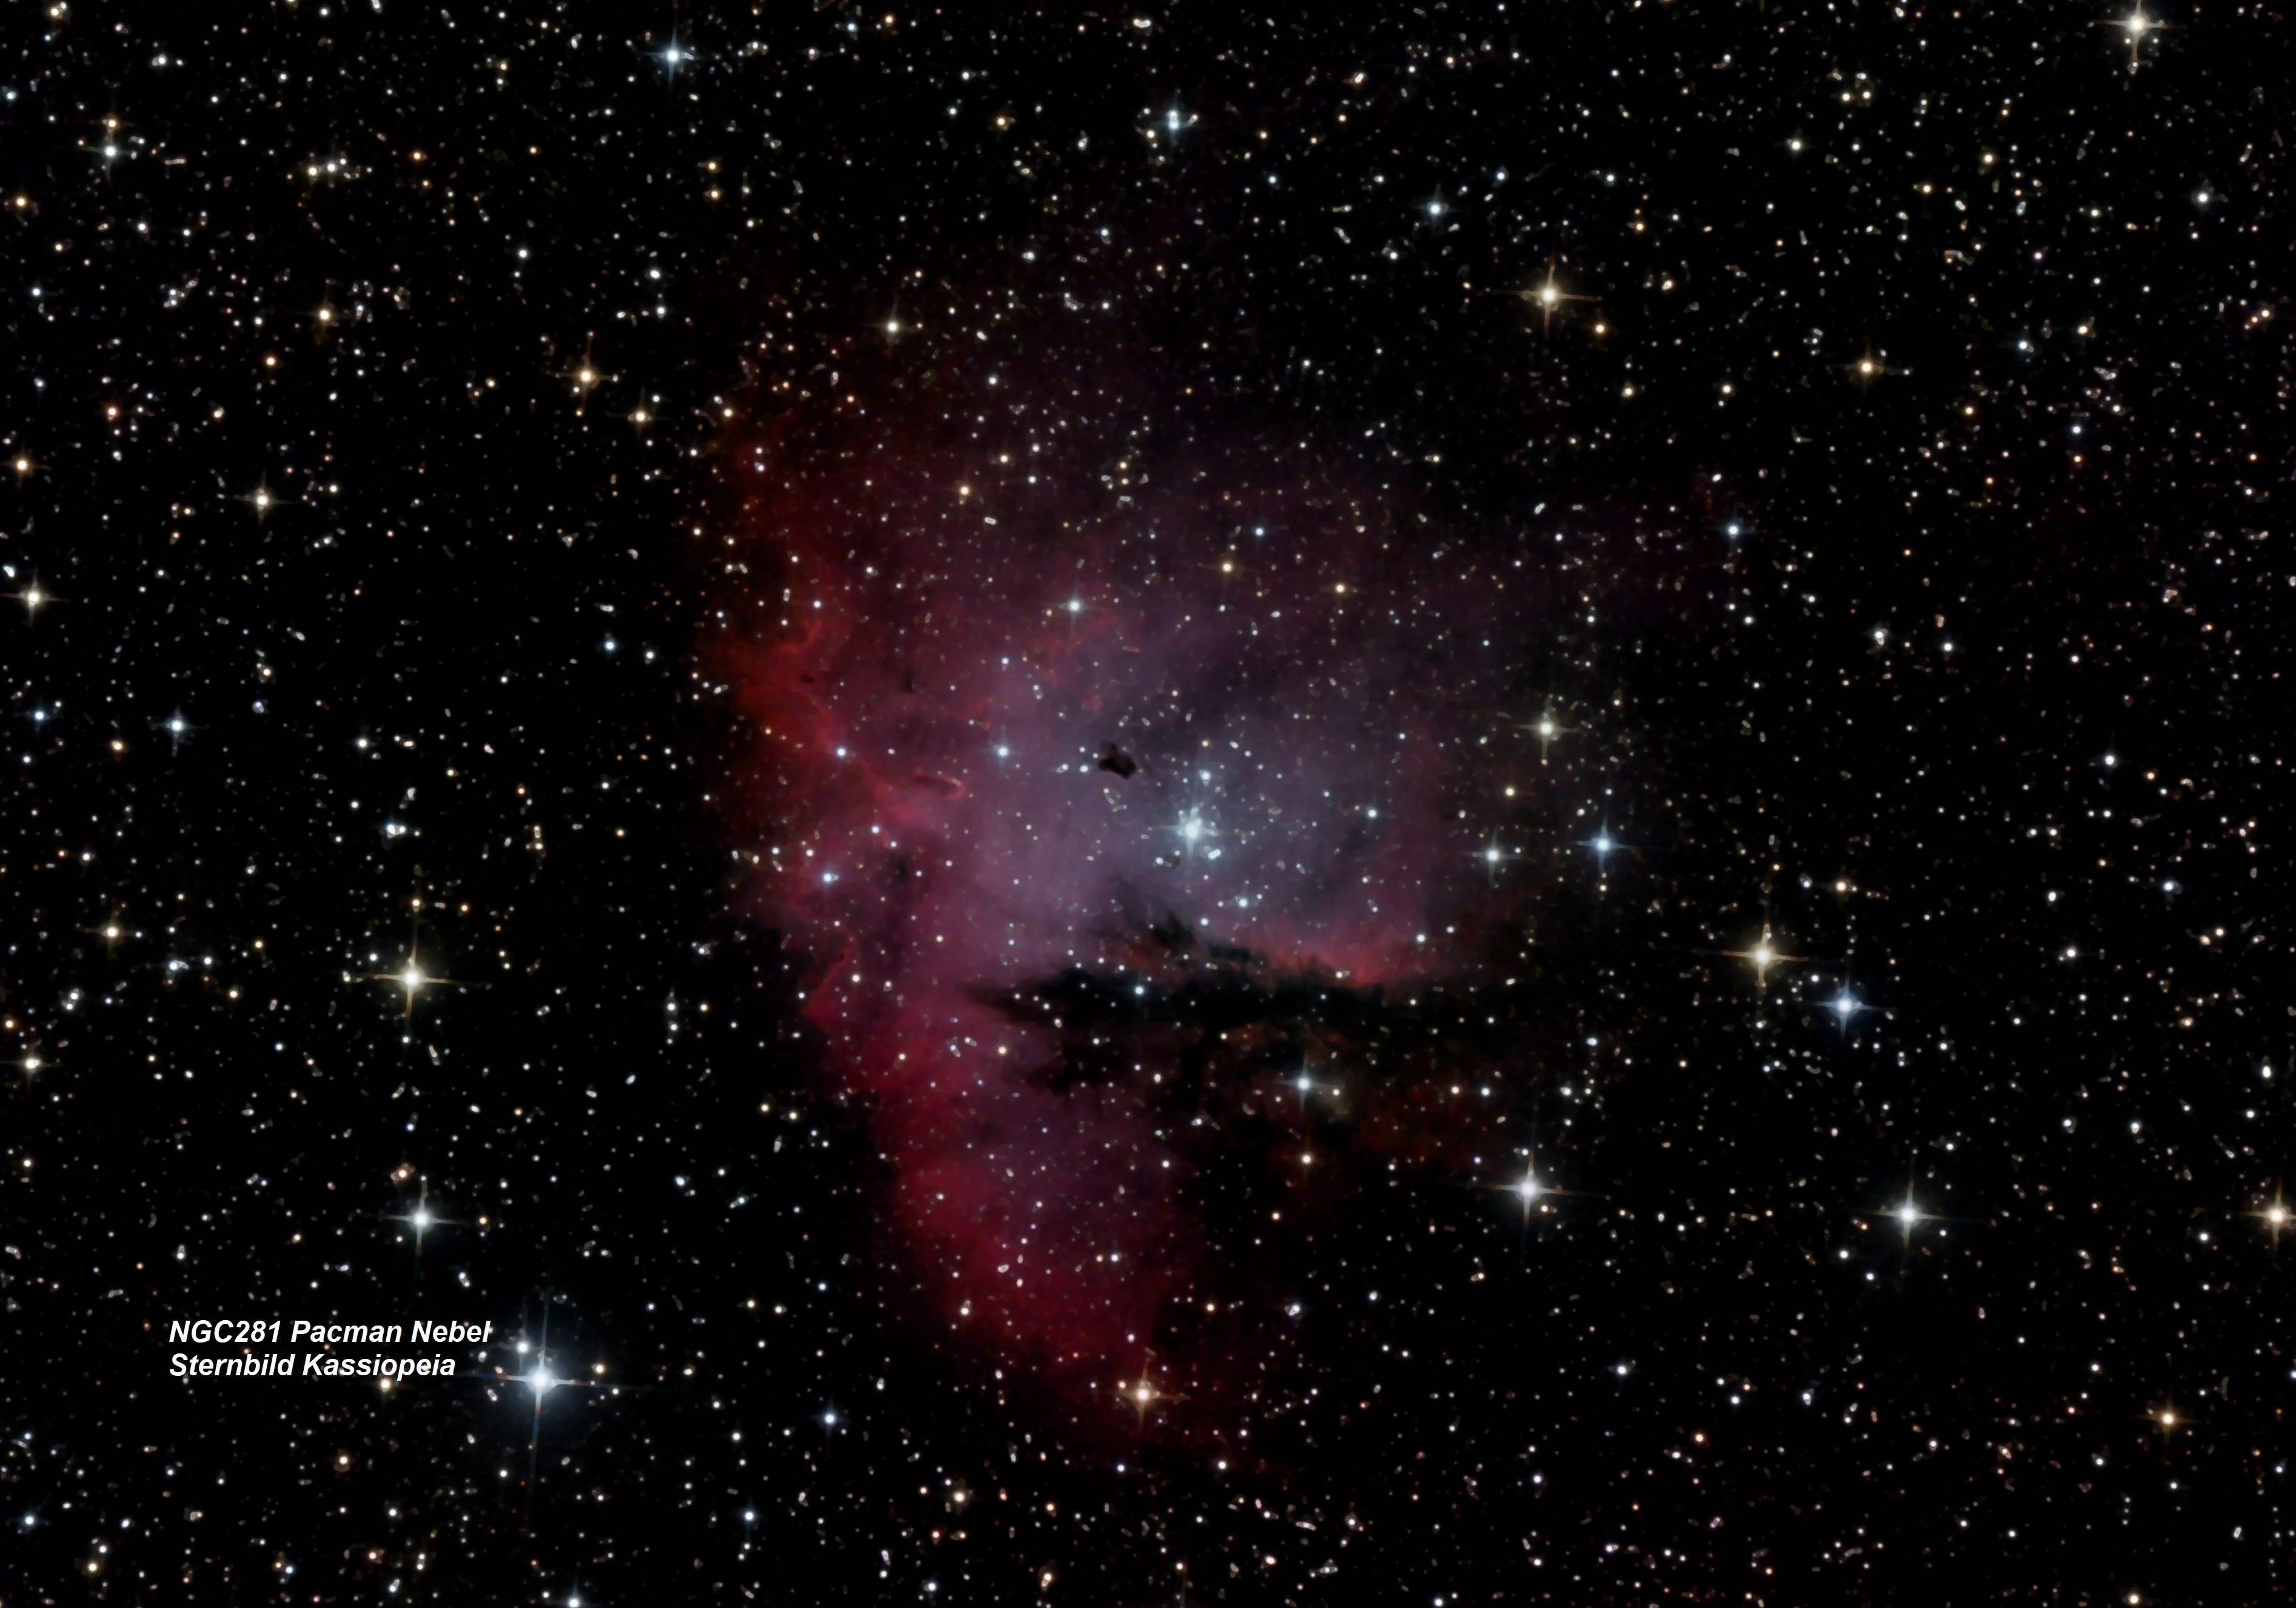 NGC 281 Pacman Nebel